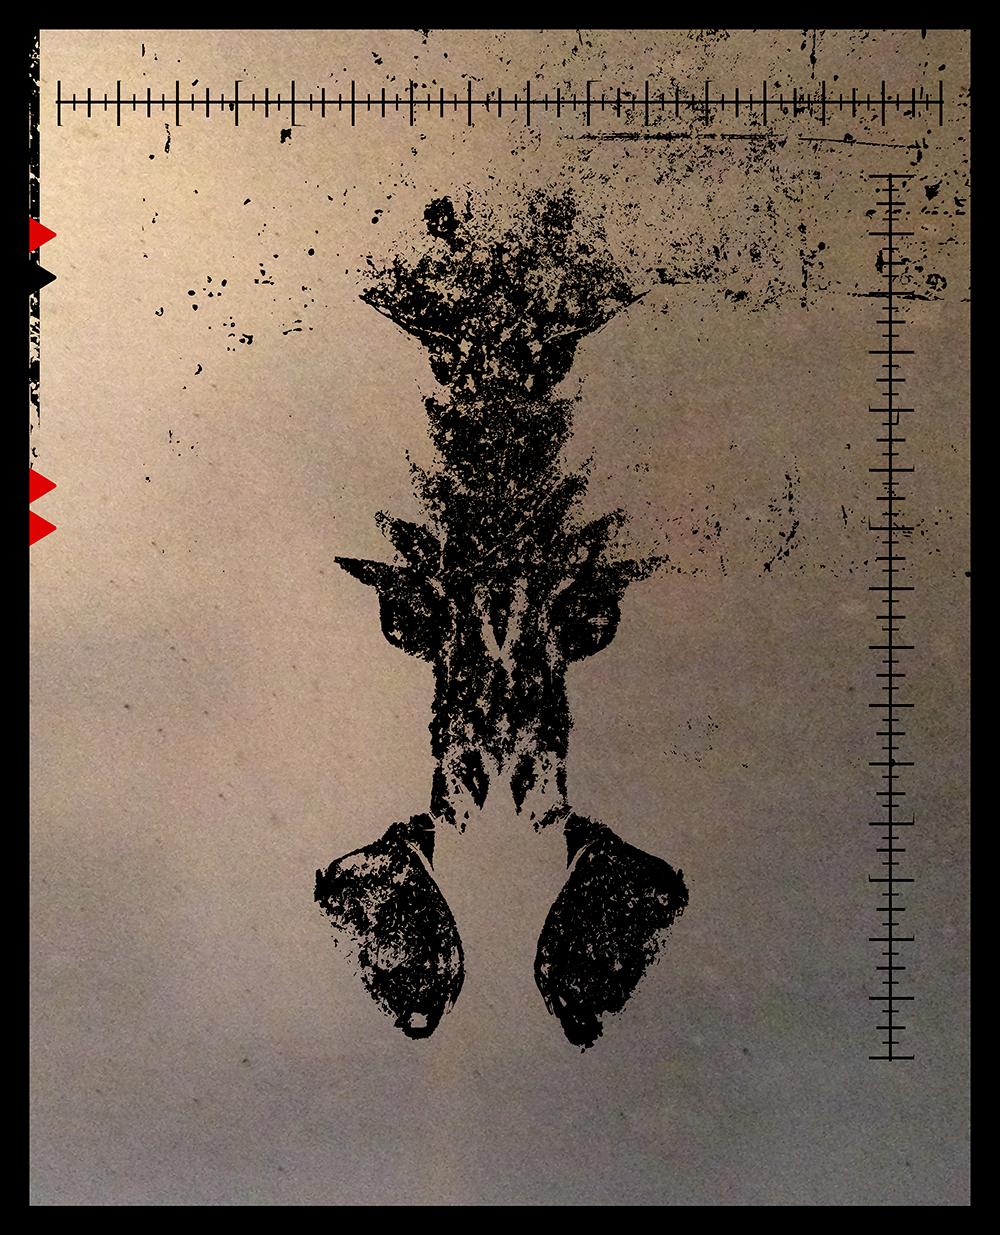 SALACIA-silhouette-5.png